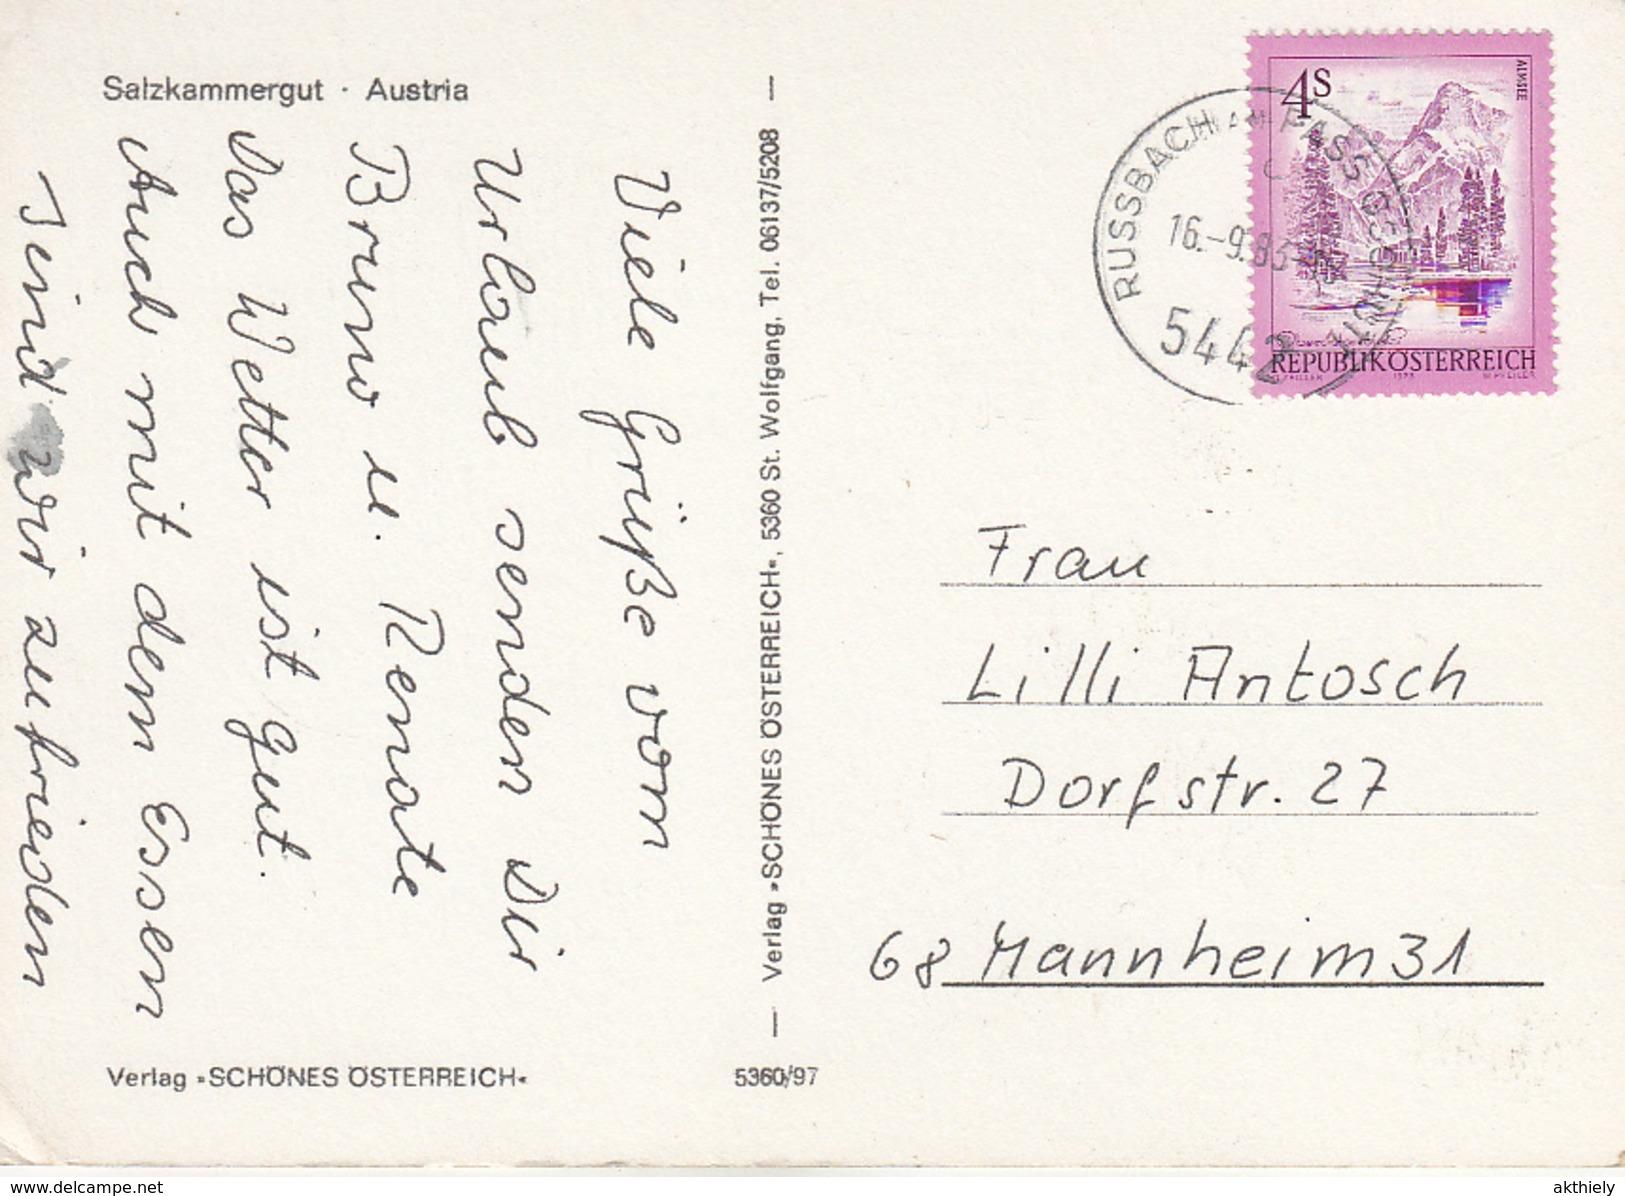 Salzkammergut Ak121972 - Autriche